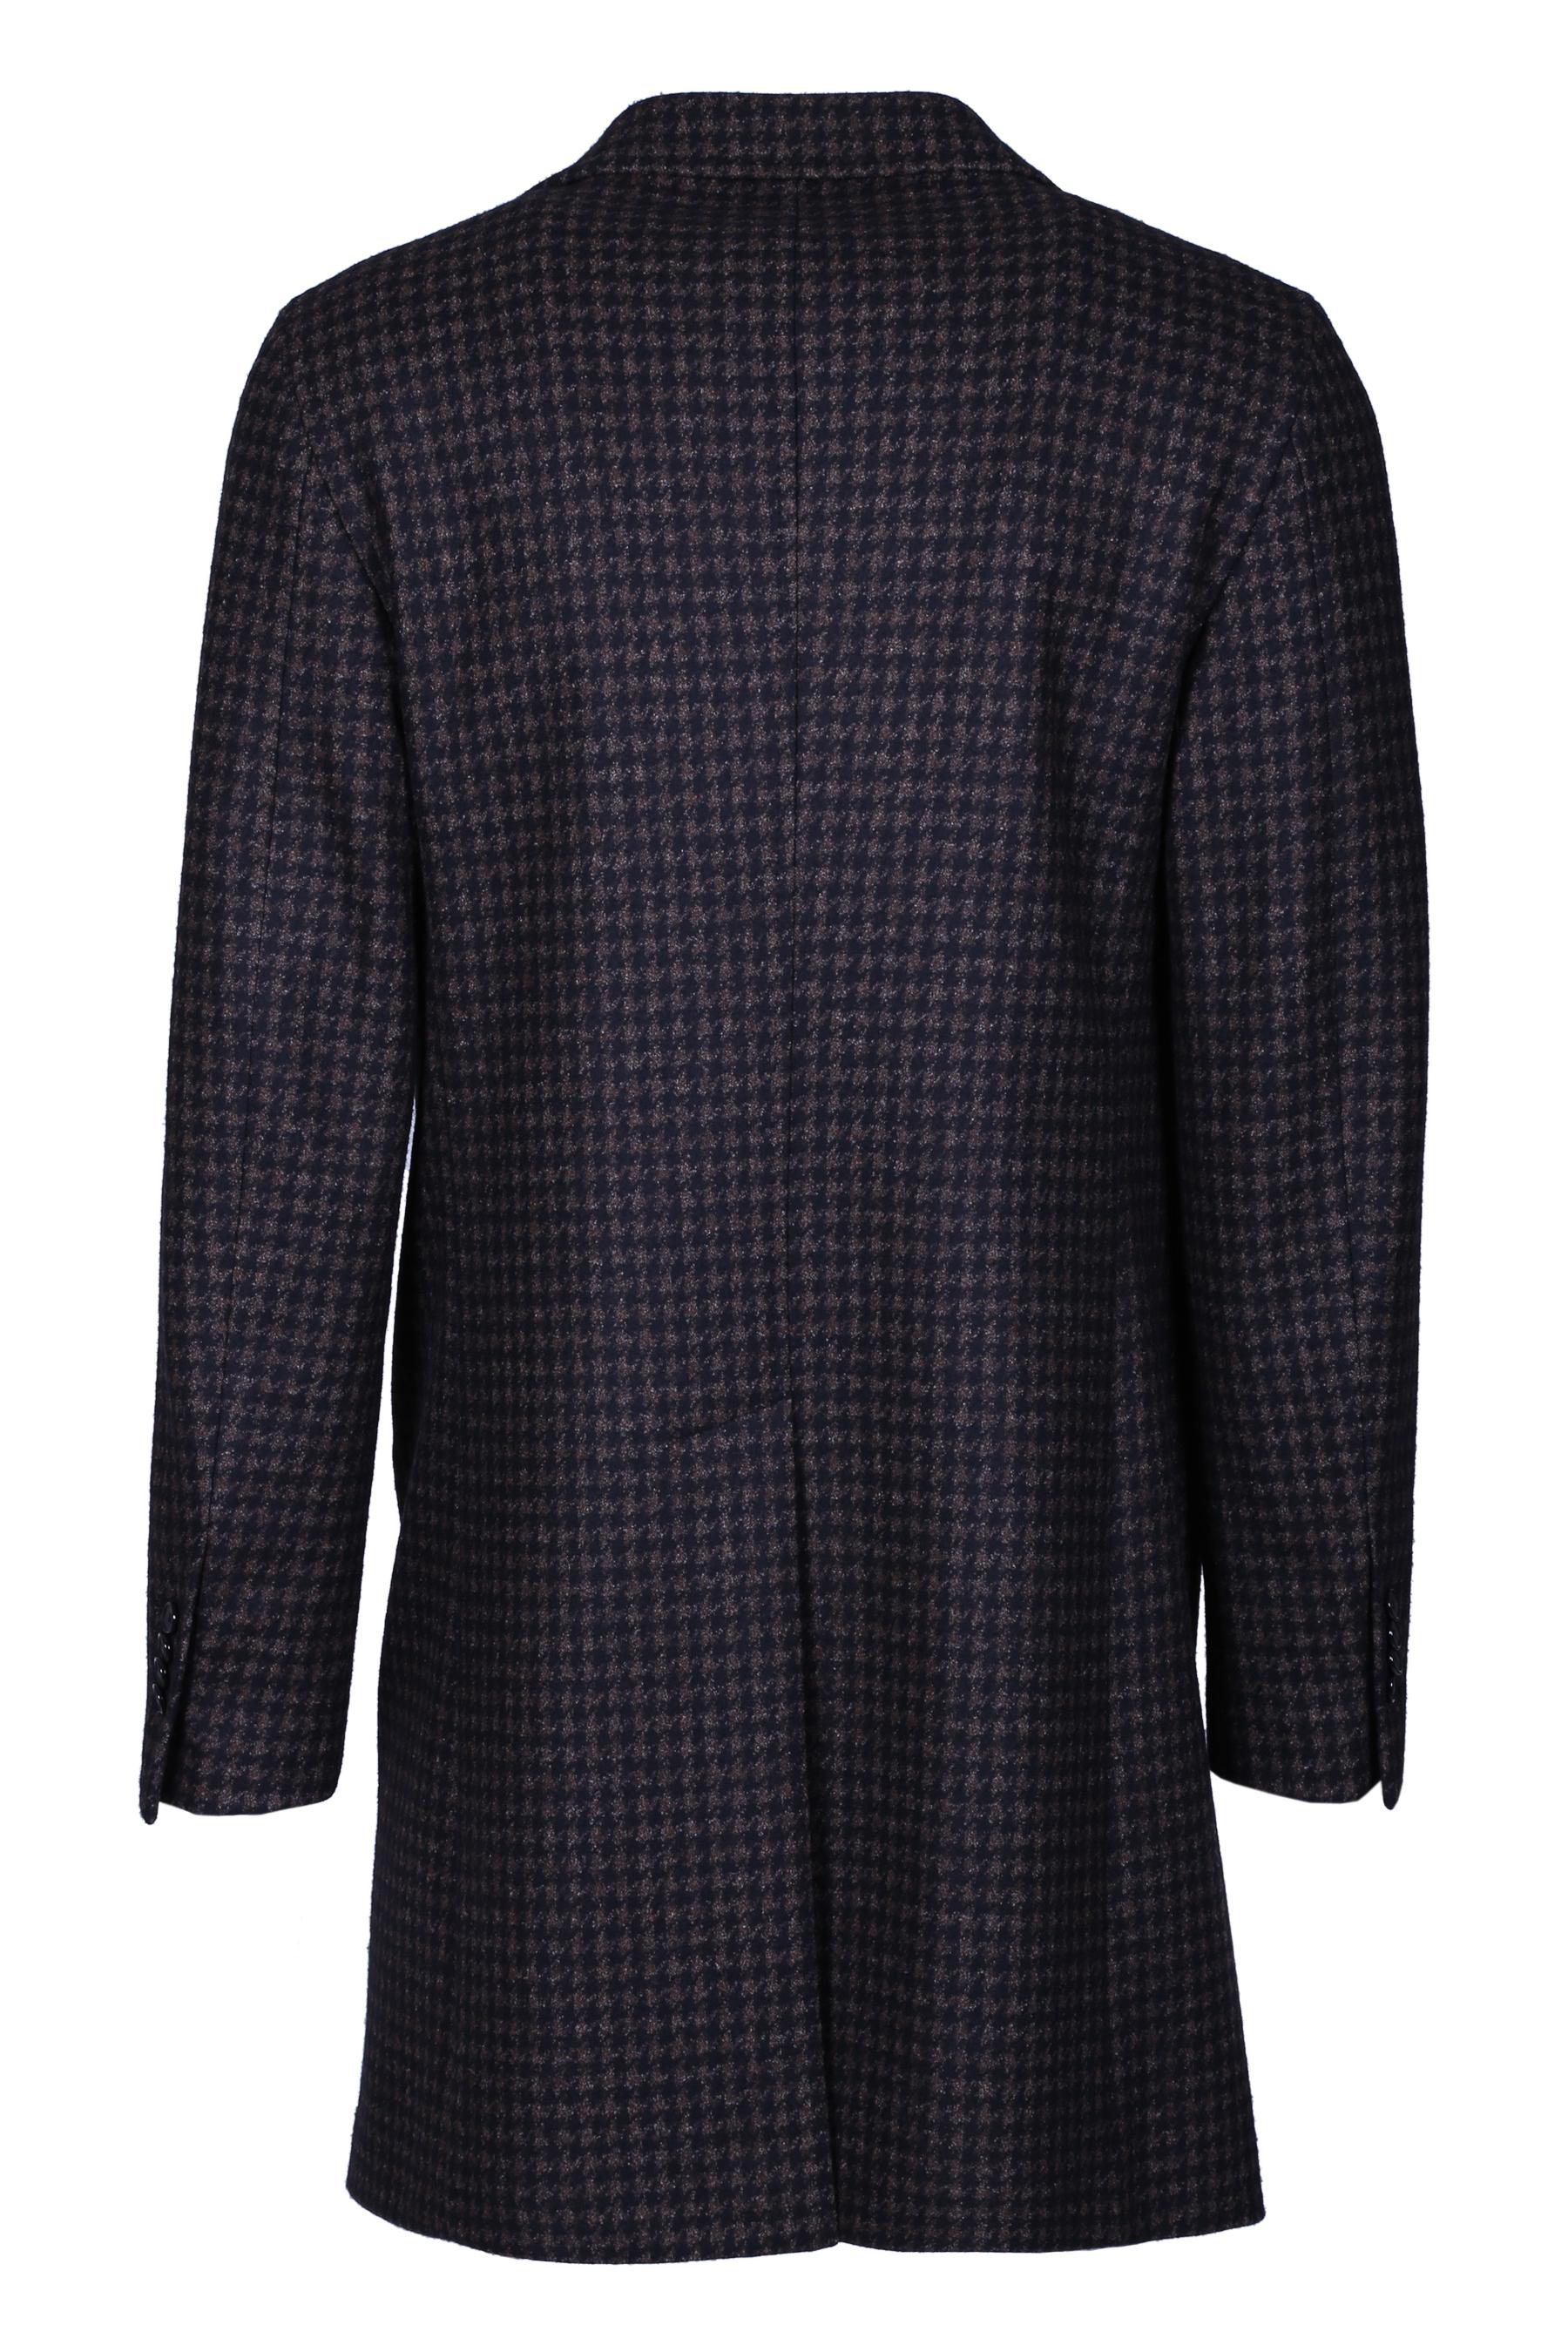 COAT IN PIED DE POULE TAGLIATORE | Overcoat | CSBJ13X57TIJ094M1514